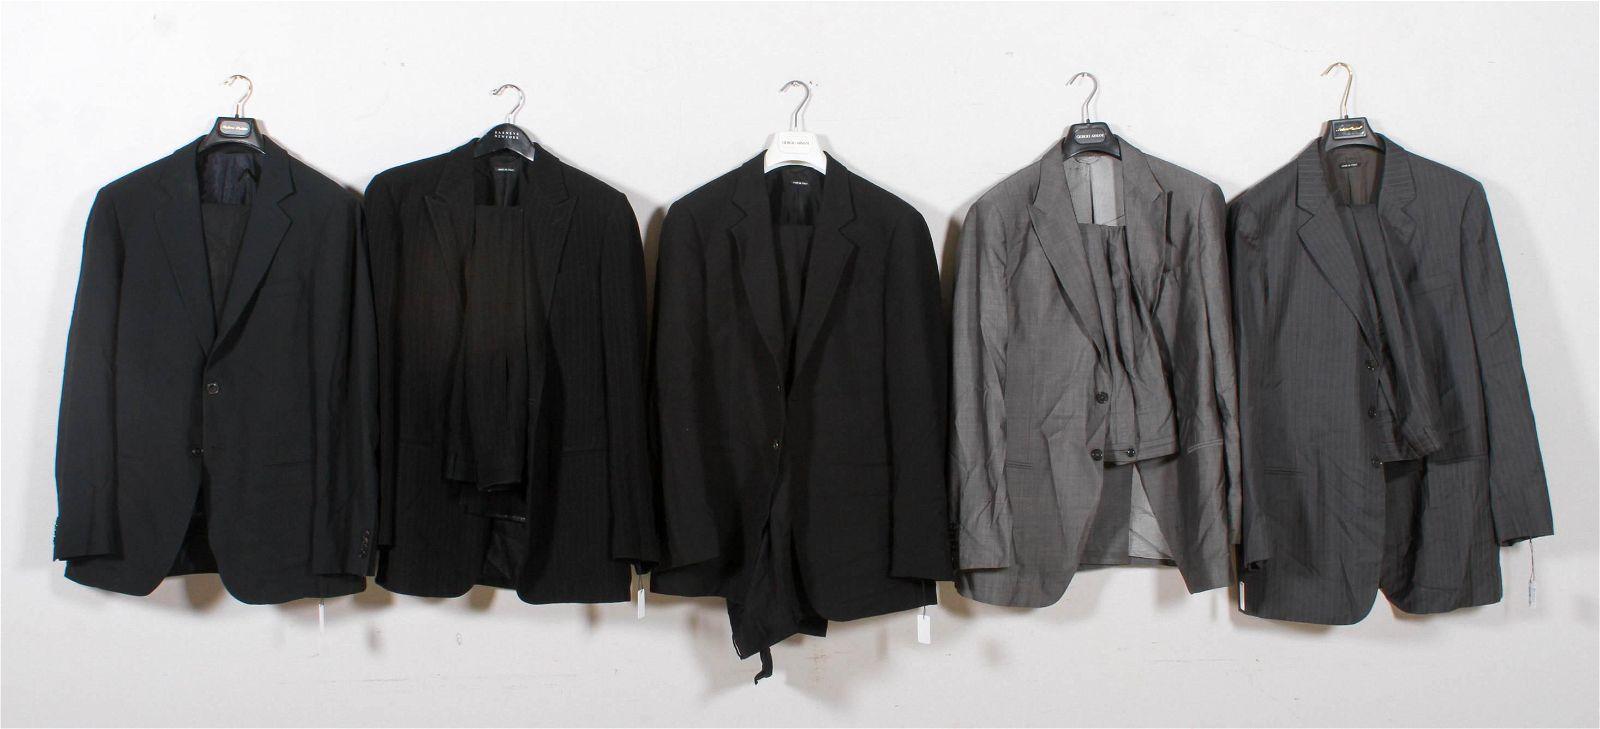 (5) Giorgio Armani Suits